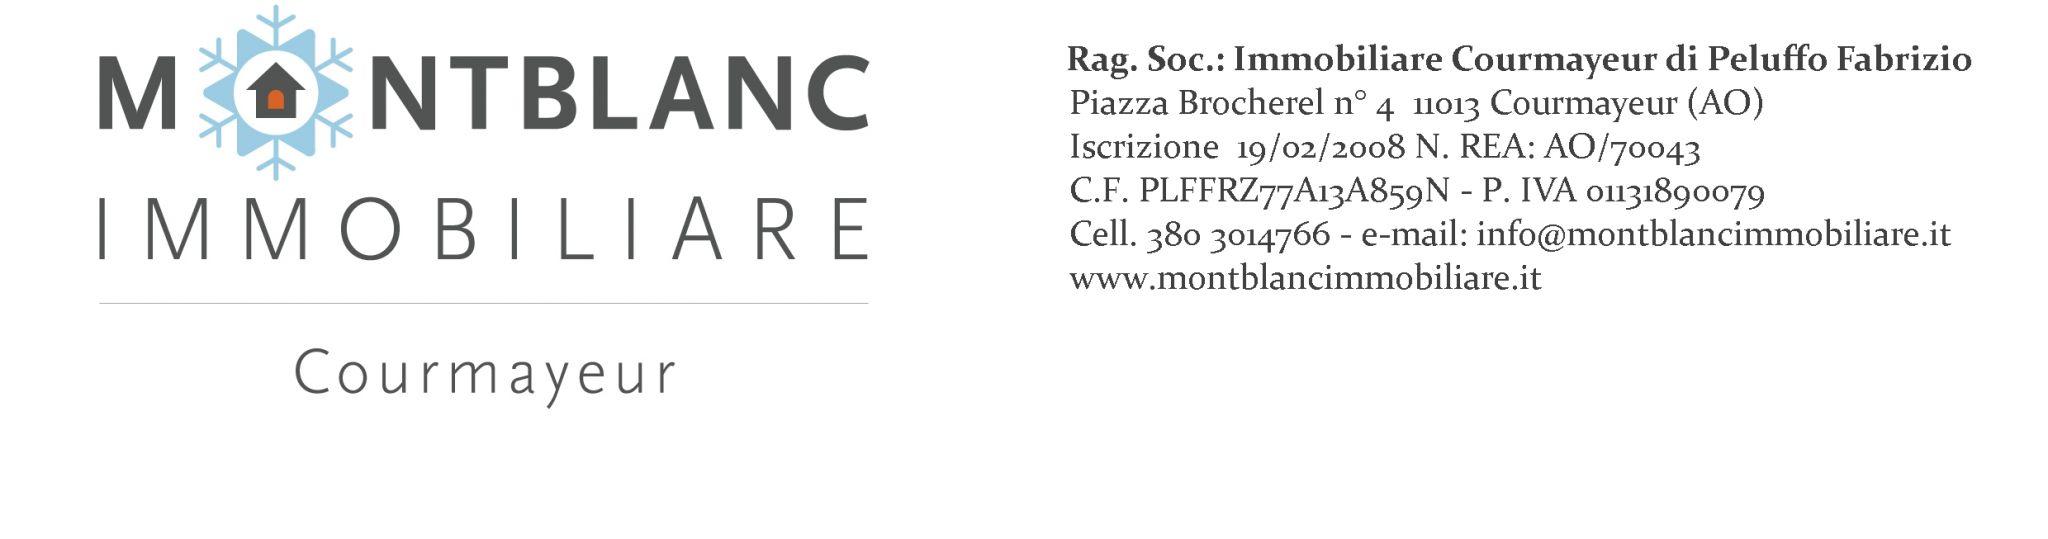 Mont Blanc Immobiliare